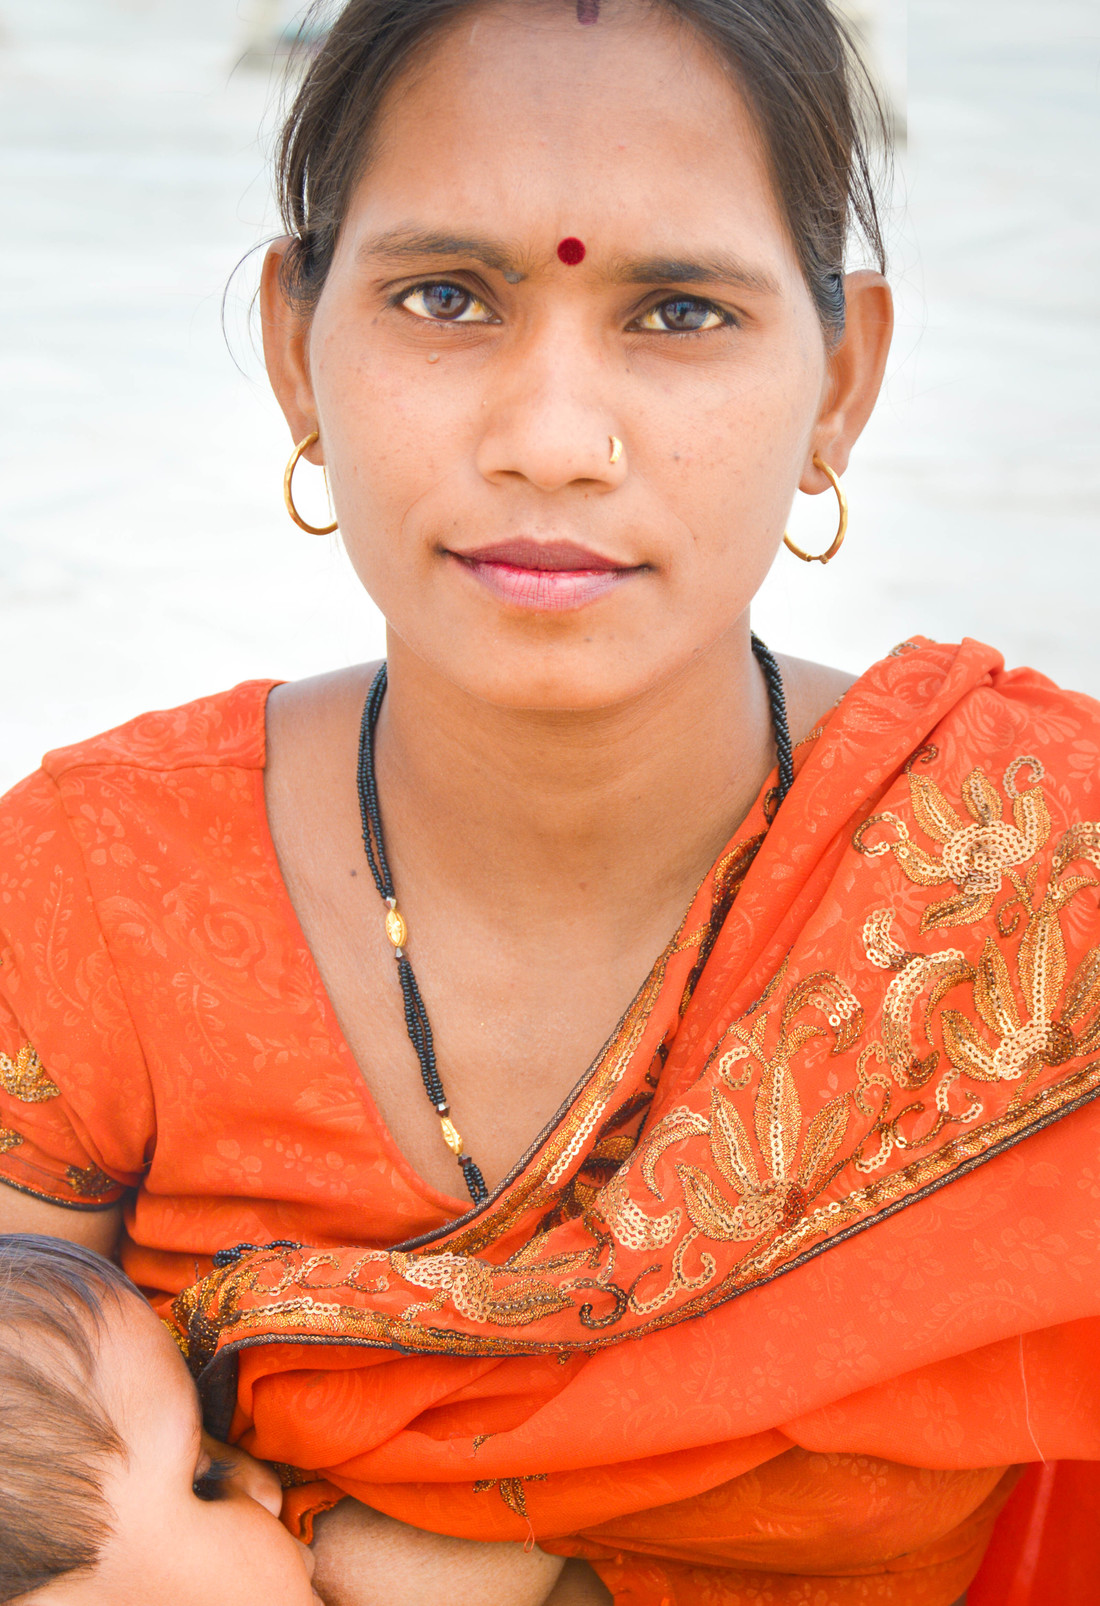 india55_1_of_1.jpg